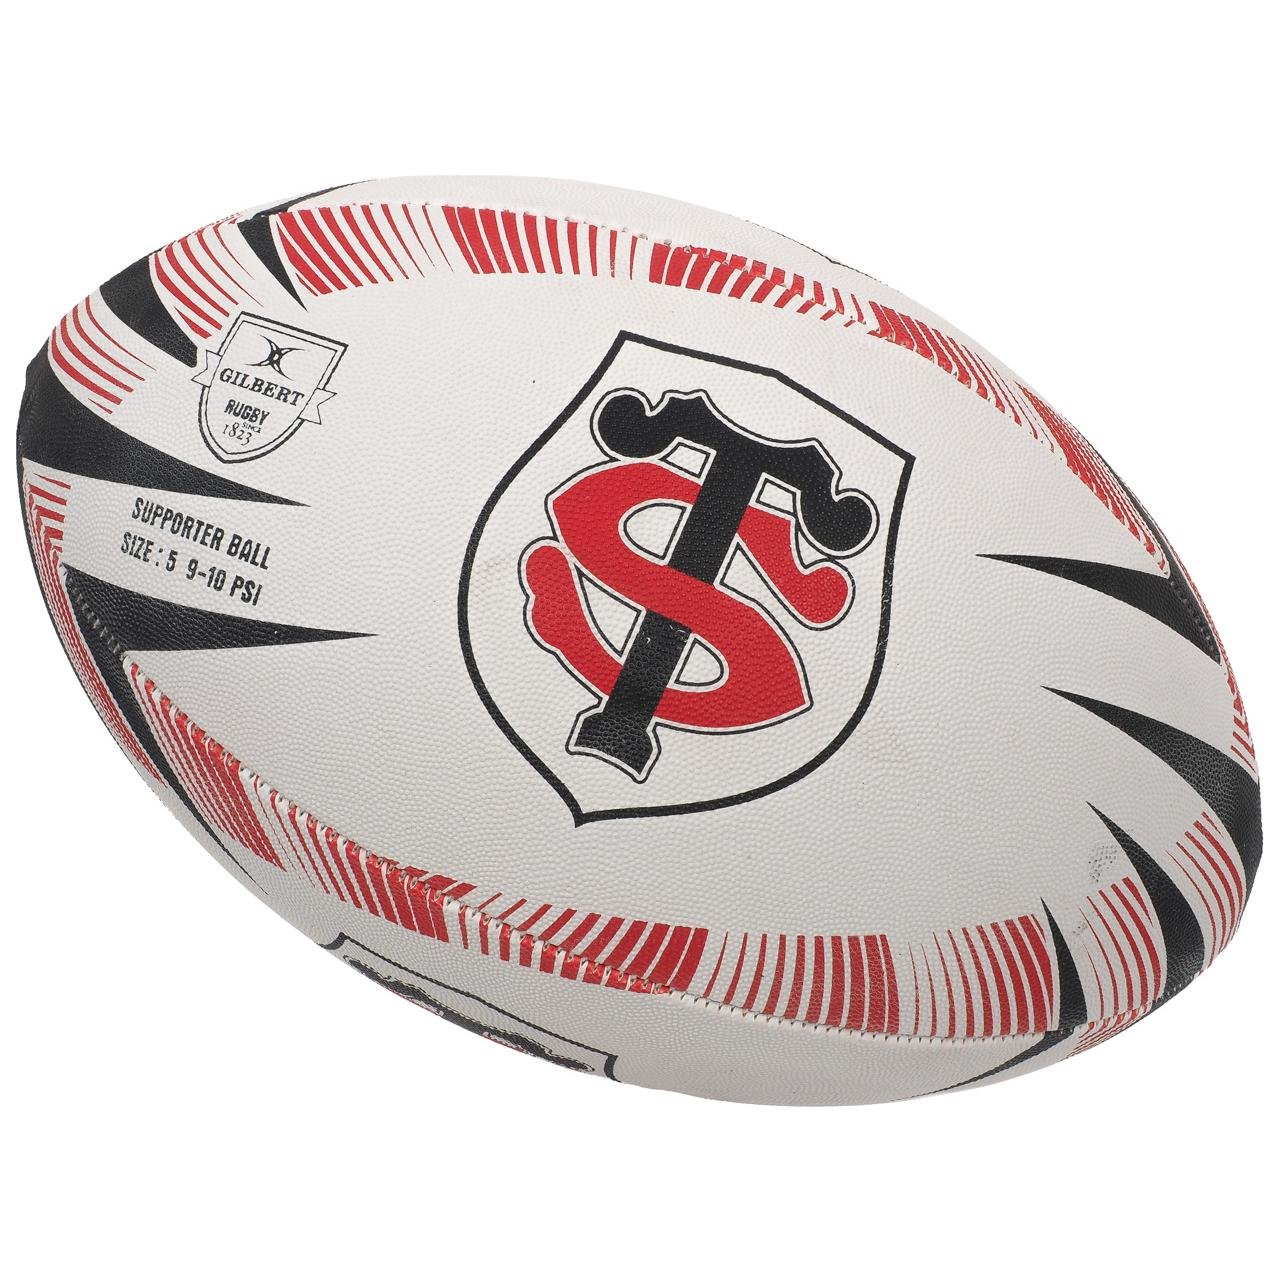 Gilbert Ballon Rugby Stade Toulousain - Supporter - T5 5024686283163